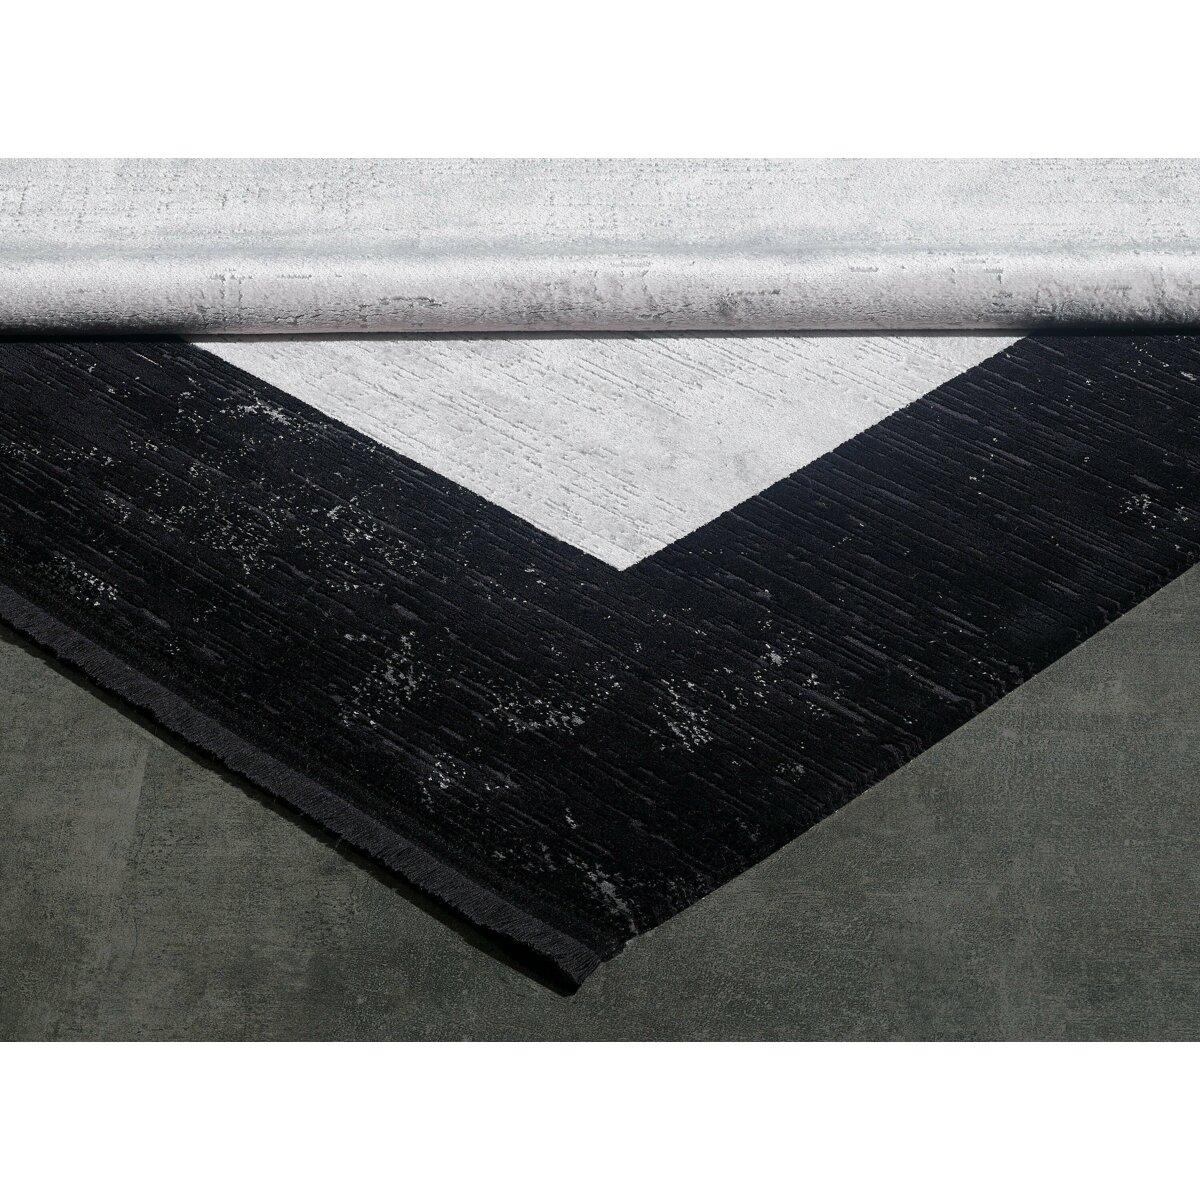 BLACK&BROWN 11321 G10 160 X 0230 GRI